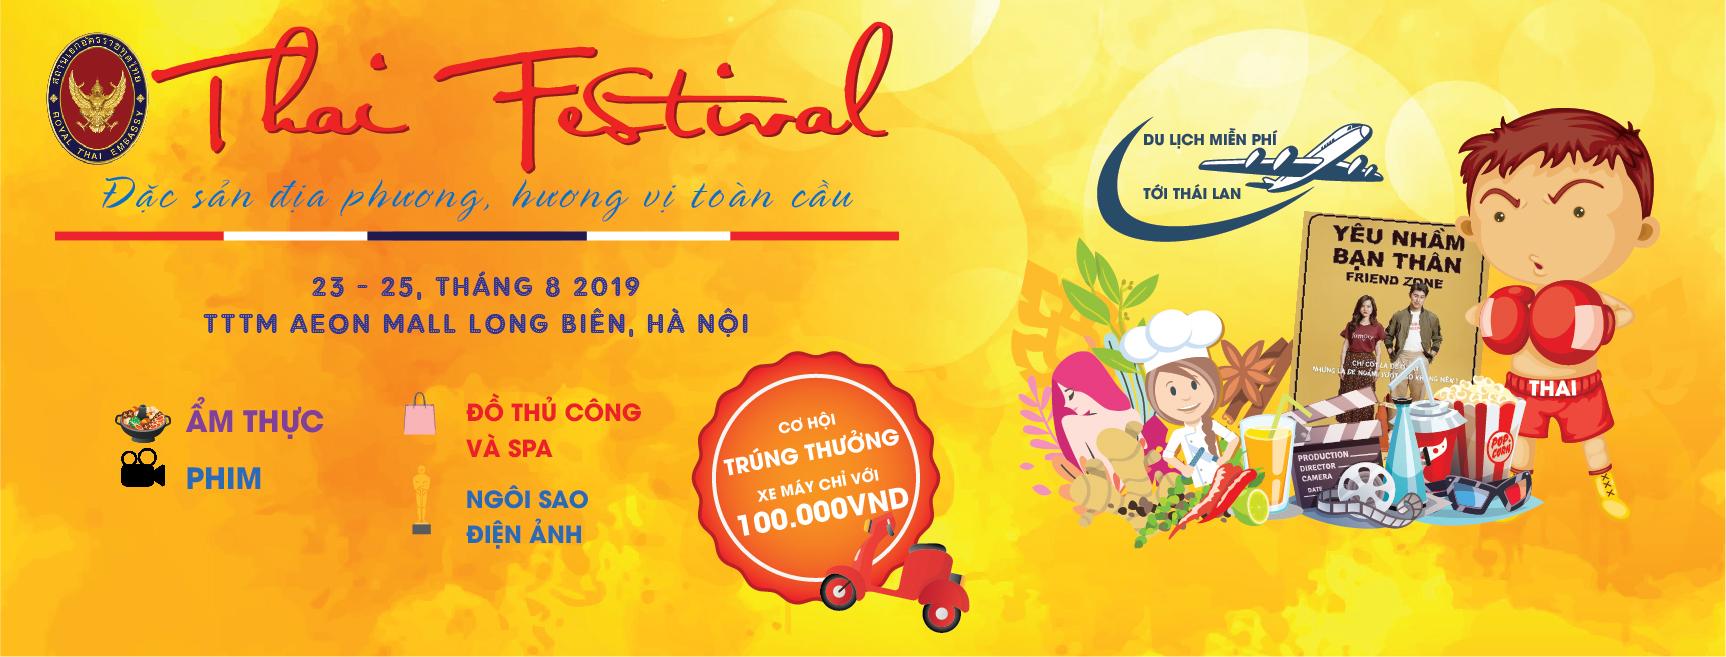 Lễ hội Thái Lan - Thai Festival 2019 tại AEON MALL Long Biên